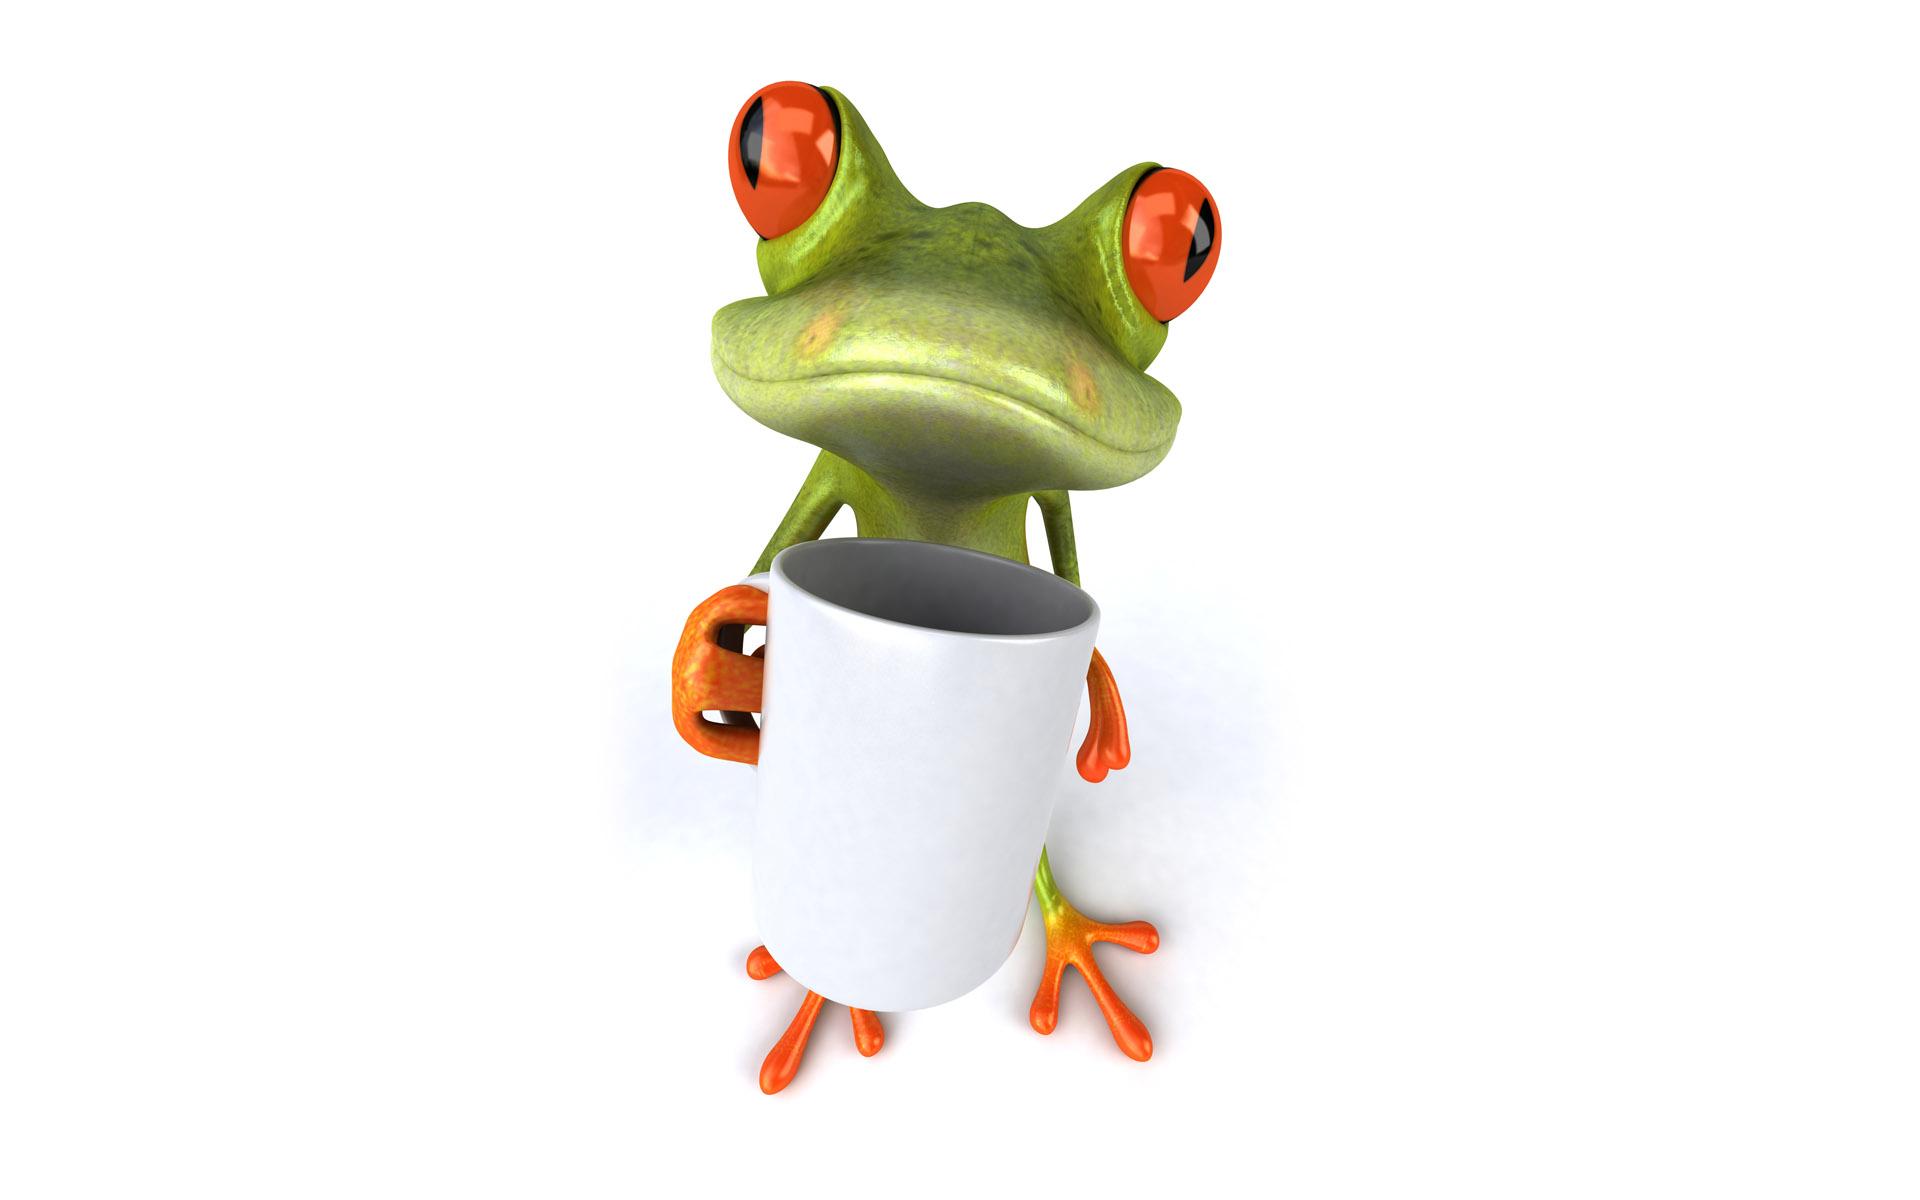 animated frog wallpaper for computer wallpapersafari